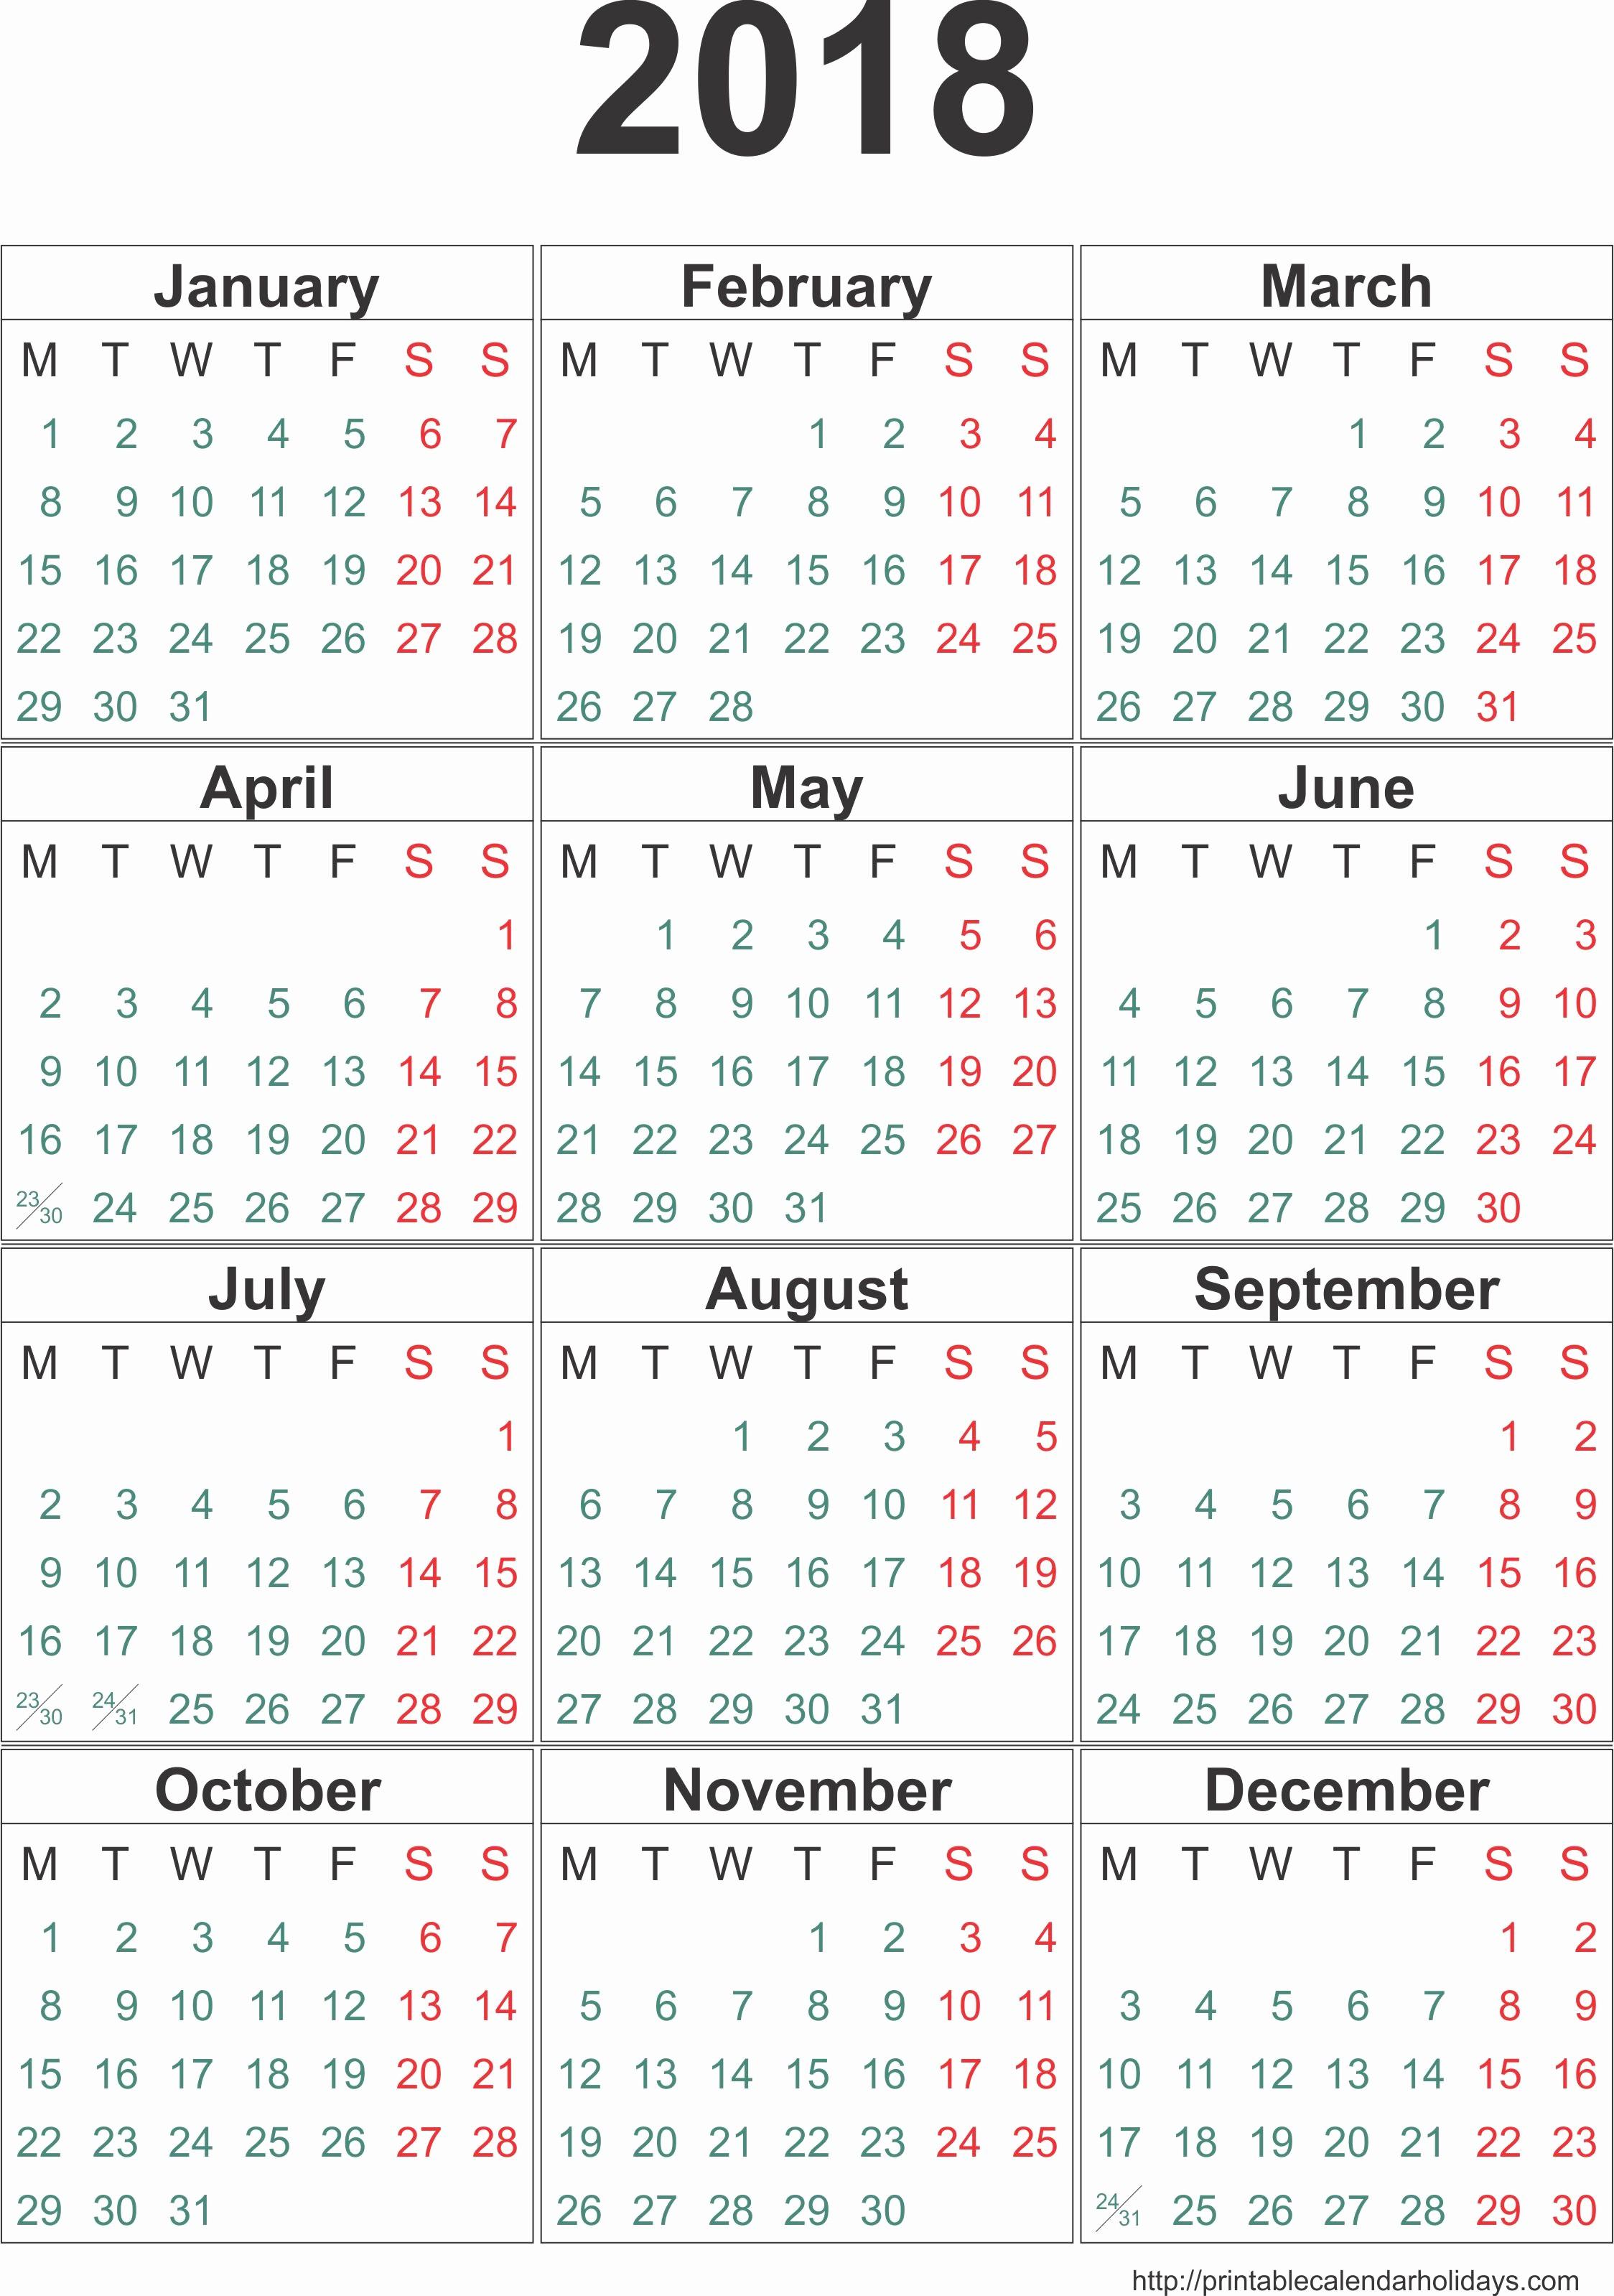 2018 Four Month Calendar Template Lovely Yearly Calendar 2018